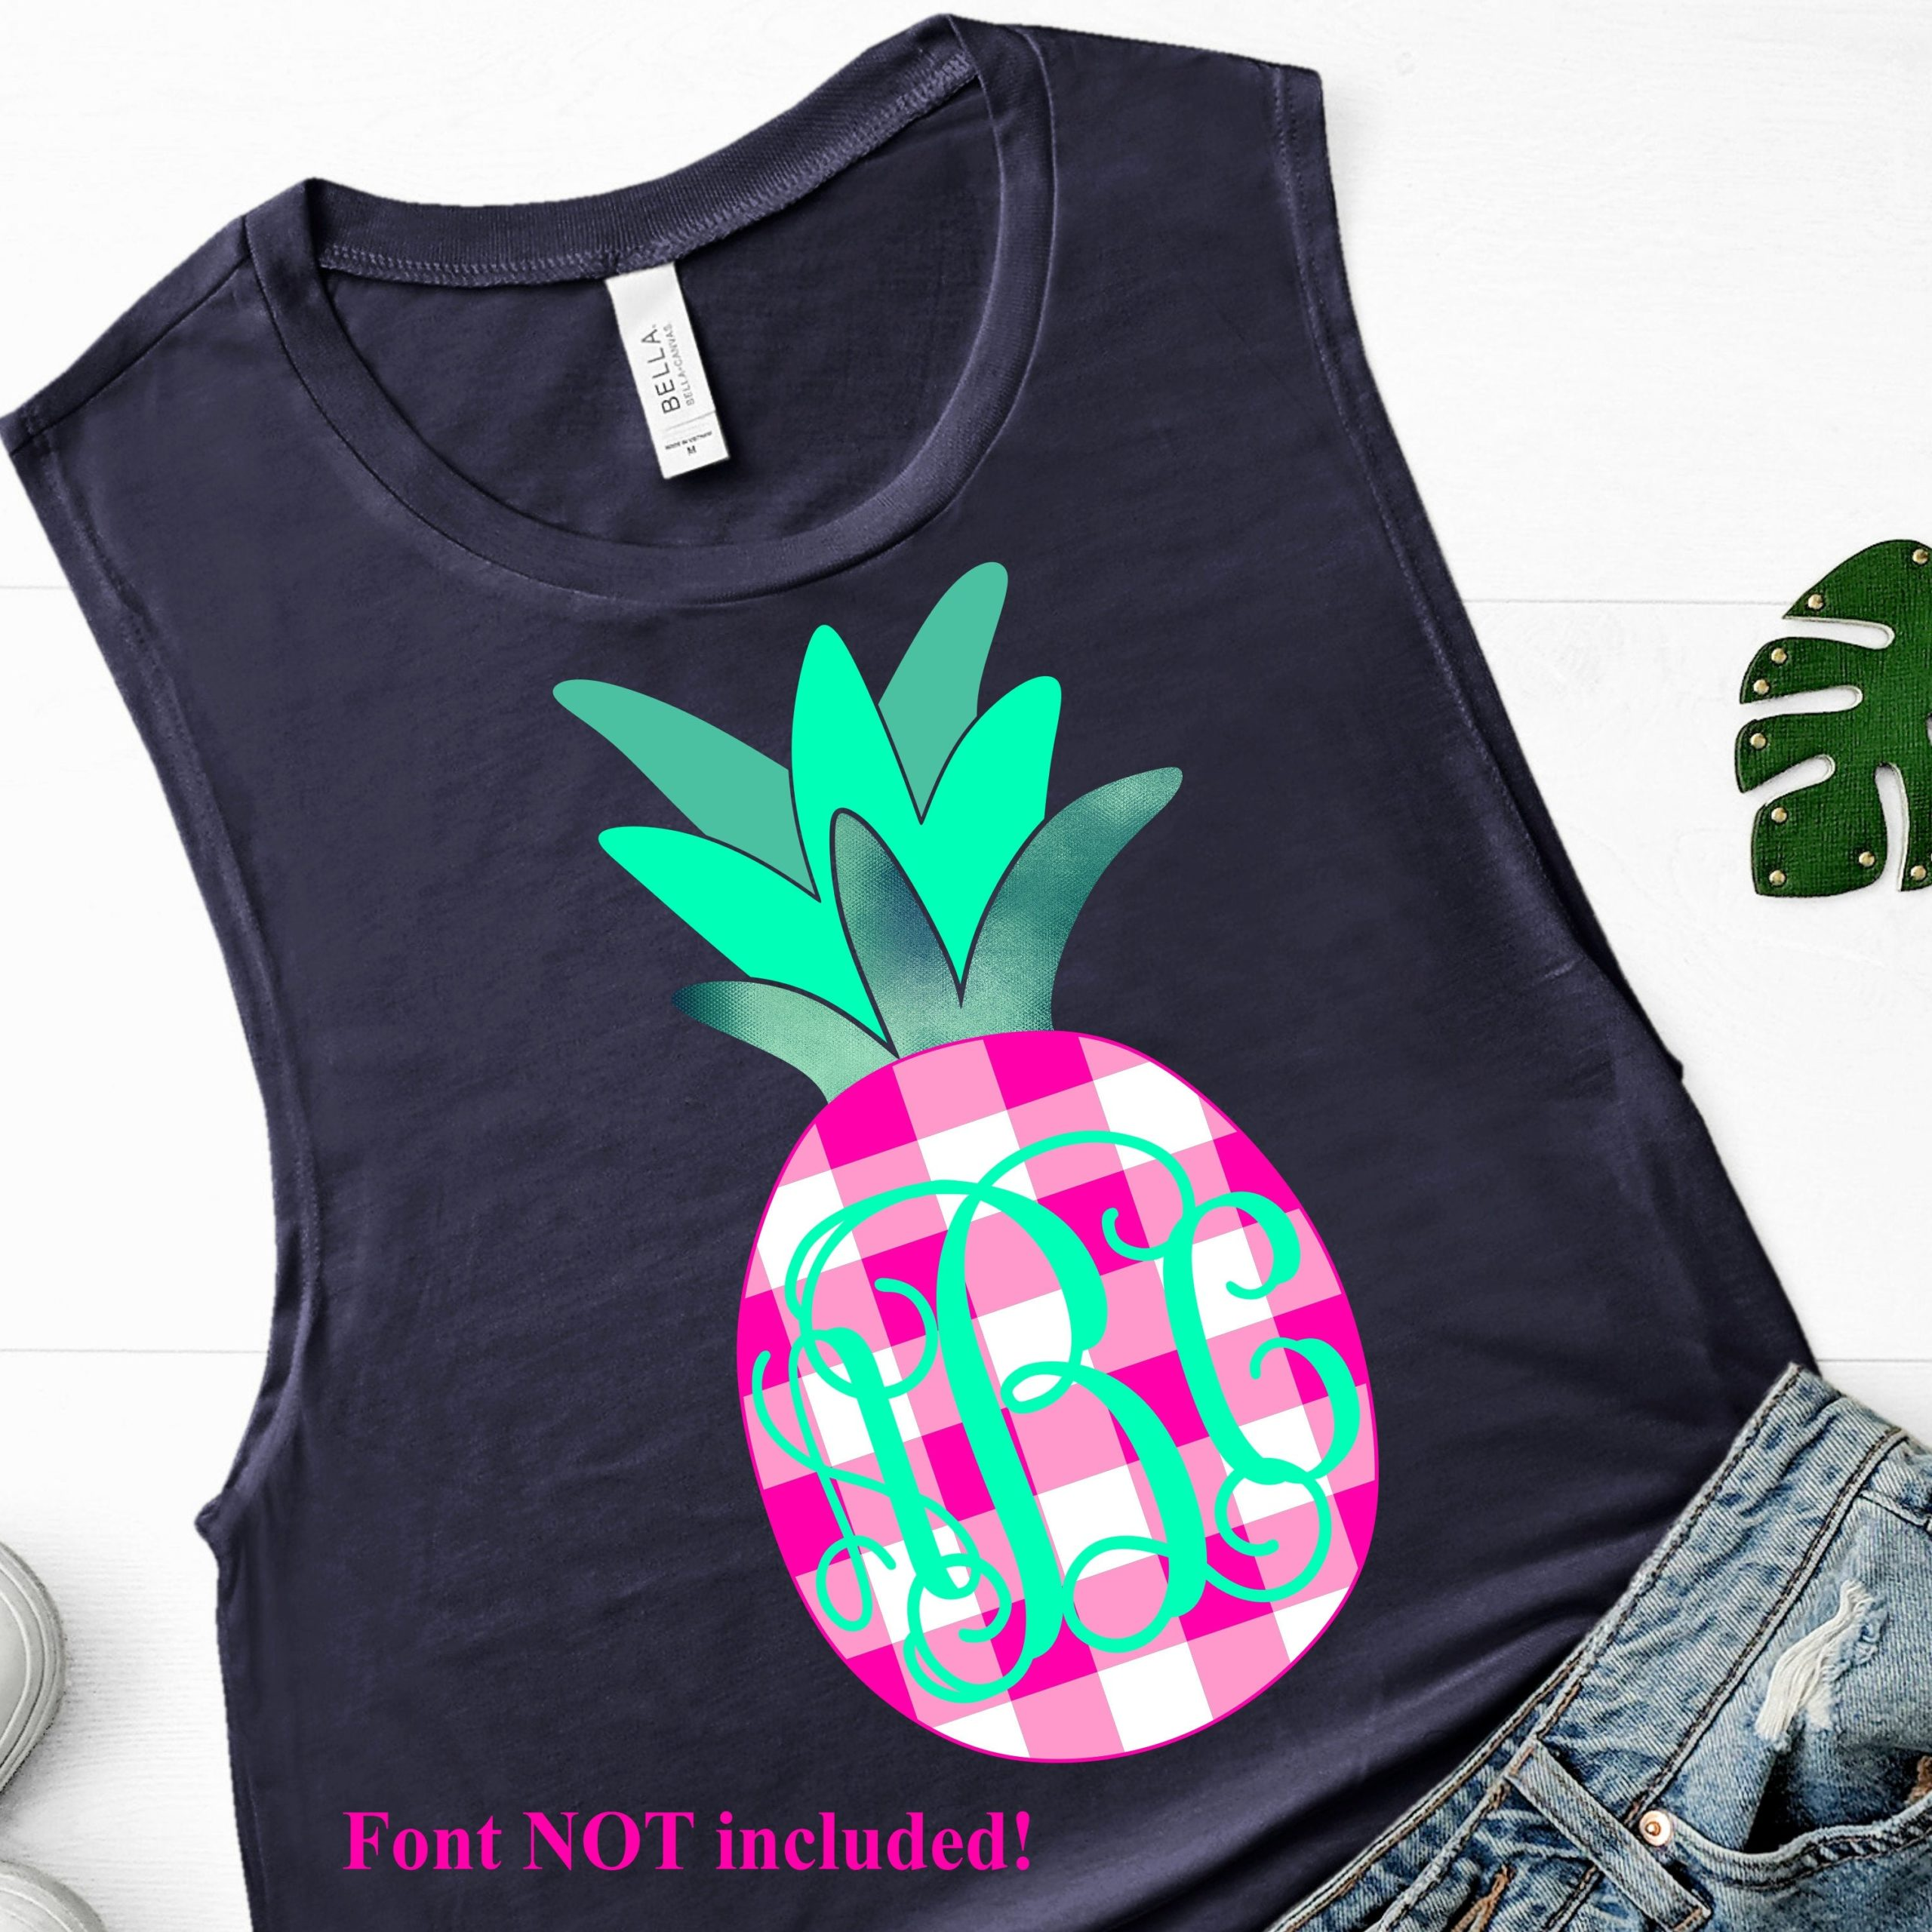 Pineapple-monogram-svg-plaid-svg-monogram-svg-beach-svg-girls-svg-svg-pngepsdxfpreppy-svgsvg-for-cricut-silhouette-dxf-5ef78dbb